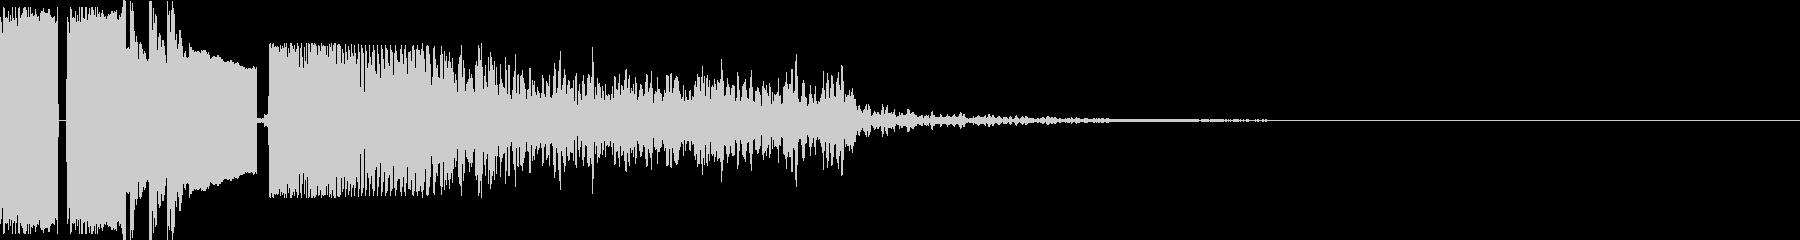 FMジングル制作におすすめの効果音の未再生の波形